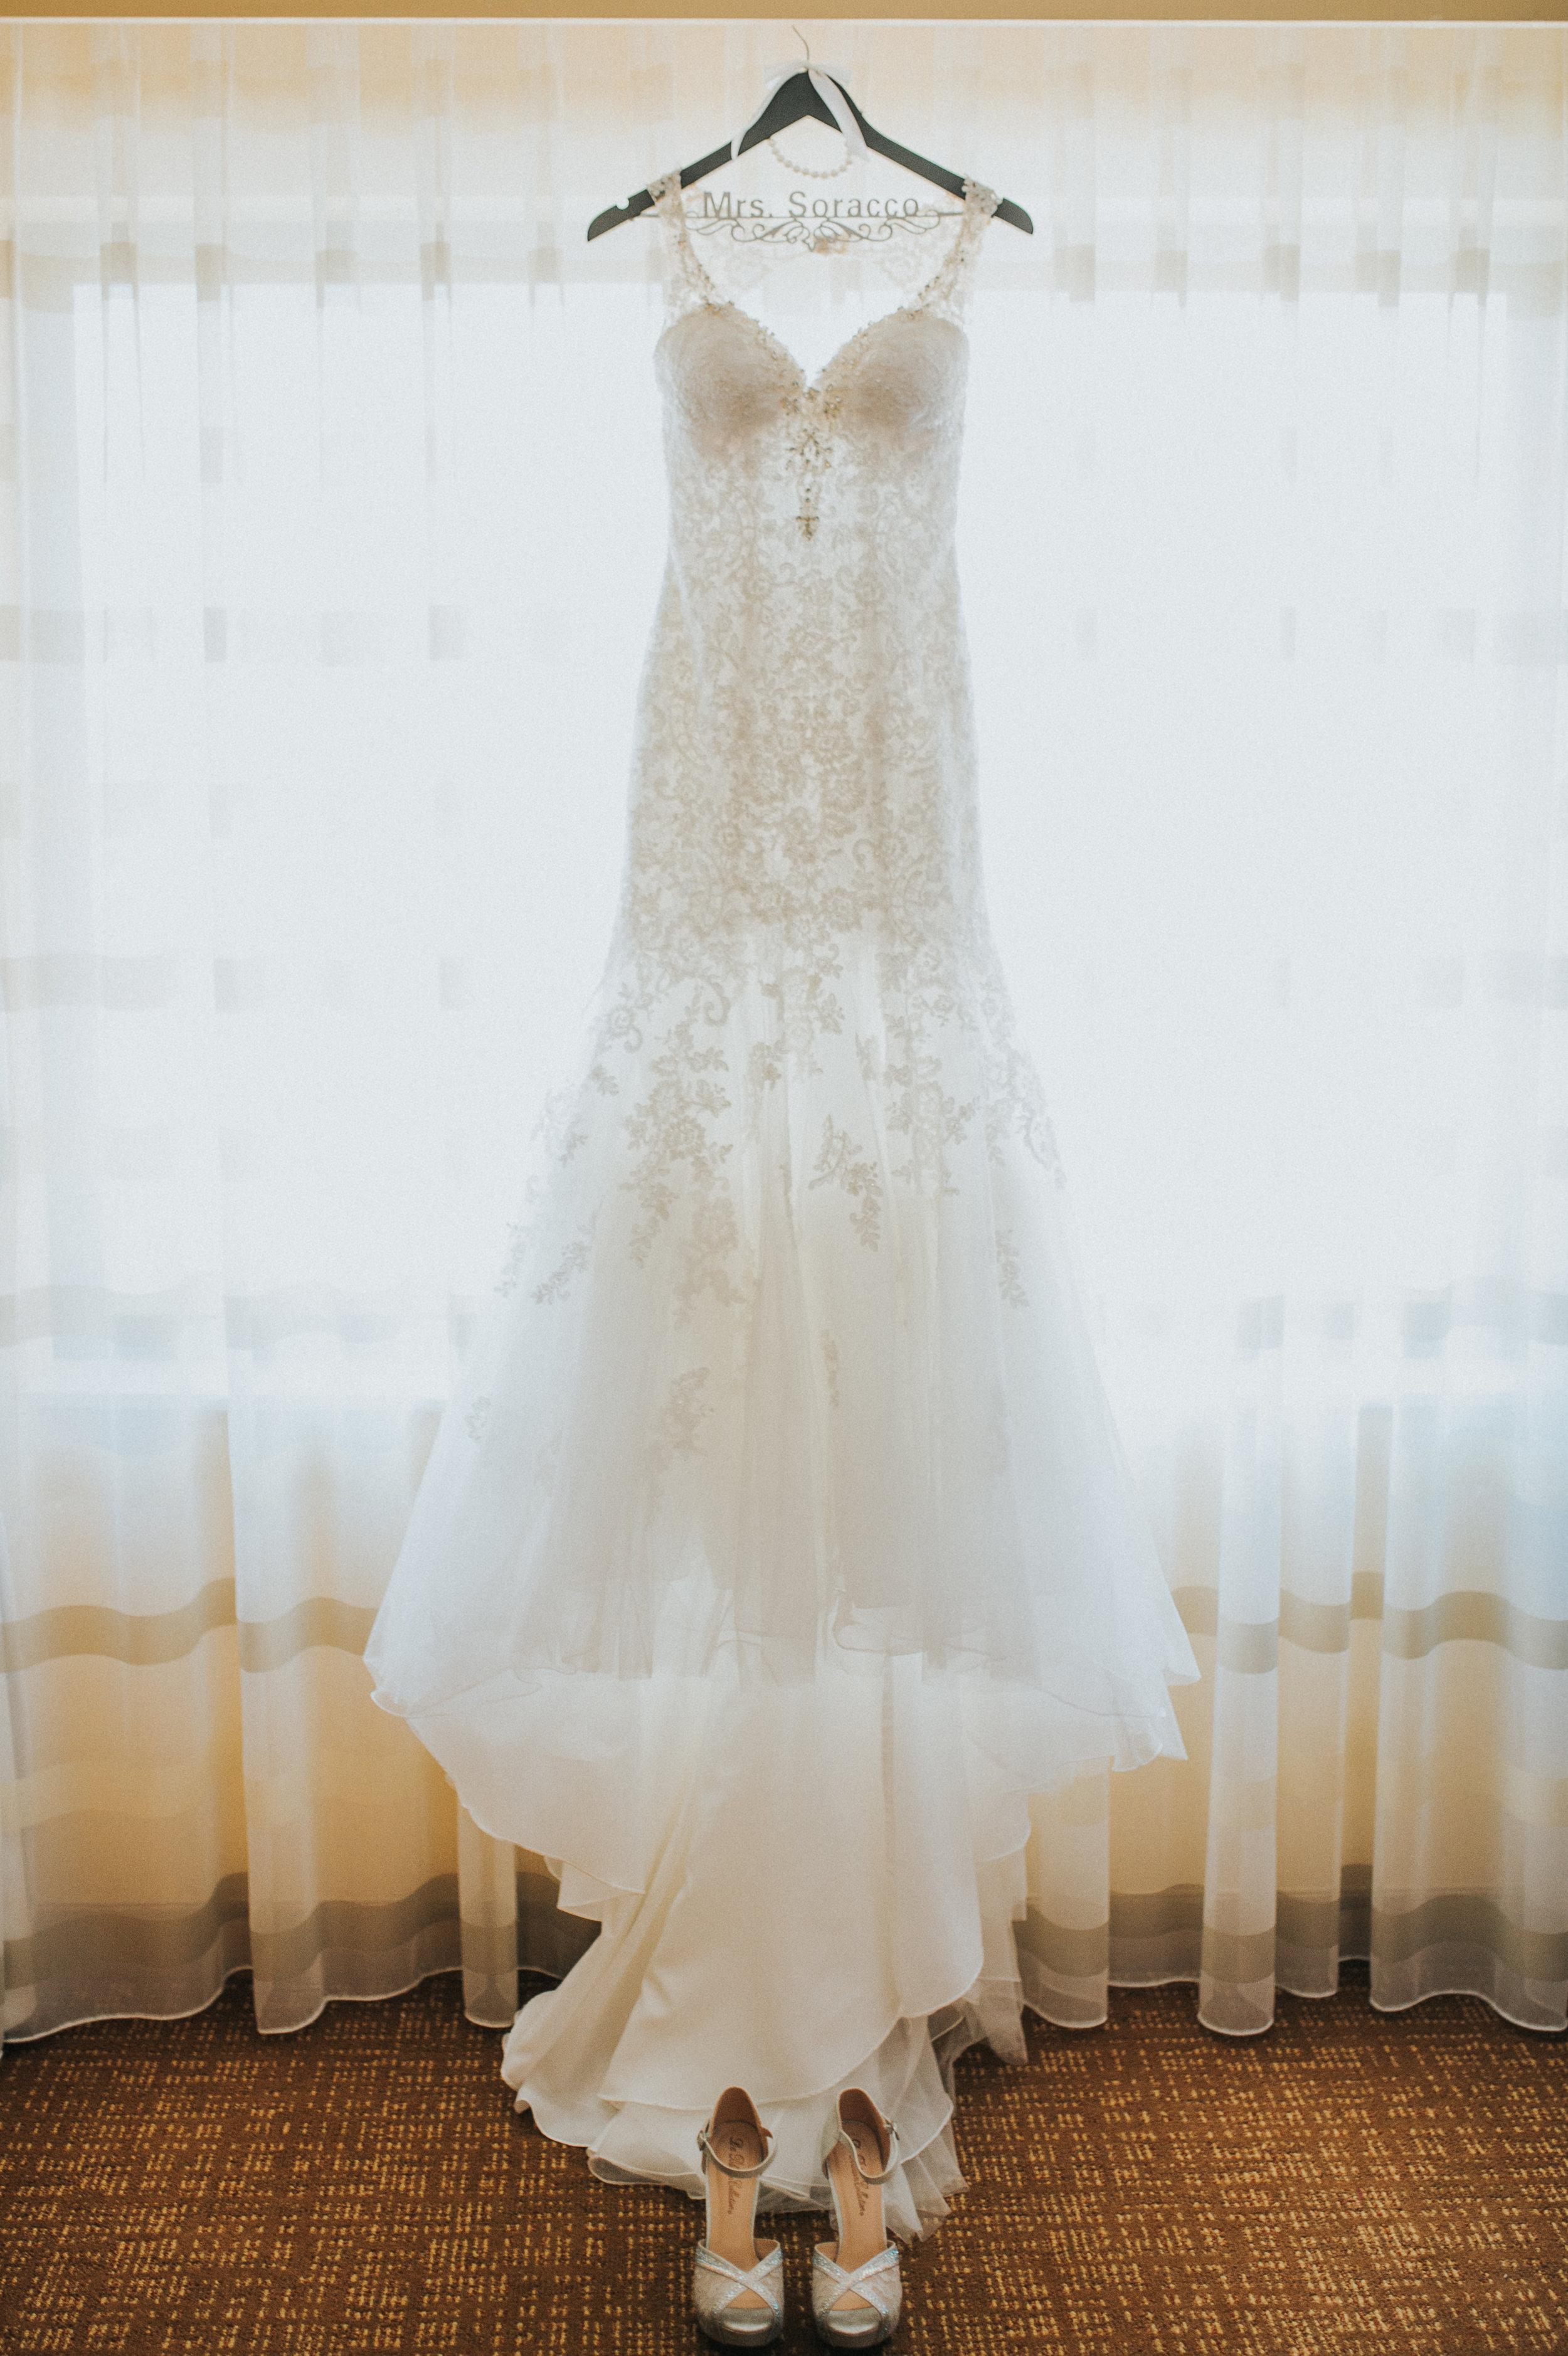 Christina-and-Gene-Wedding-Marla-Rain-Photography-59.jpg